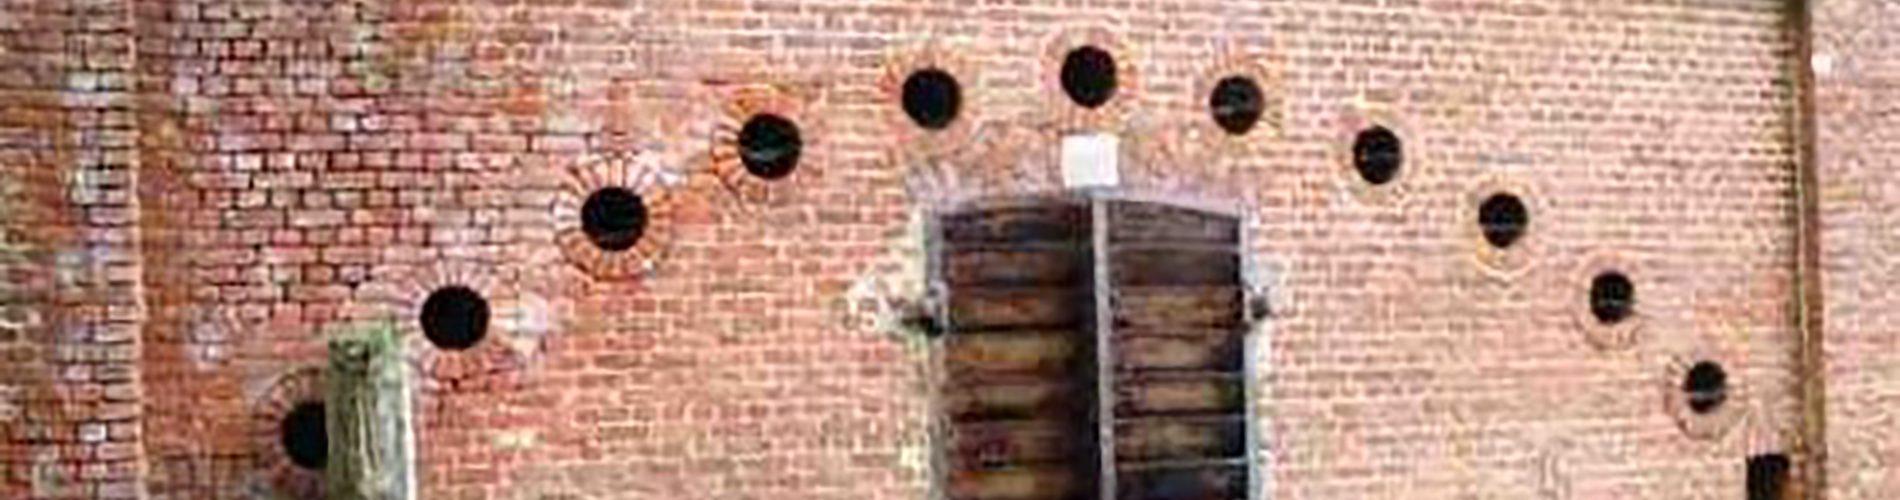 Schietgaten Fort Rozenbroek Dendermonde (c) Beeldbank Onroerend Erfgoed Duchêne Helena